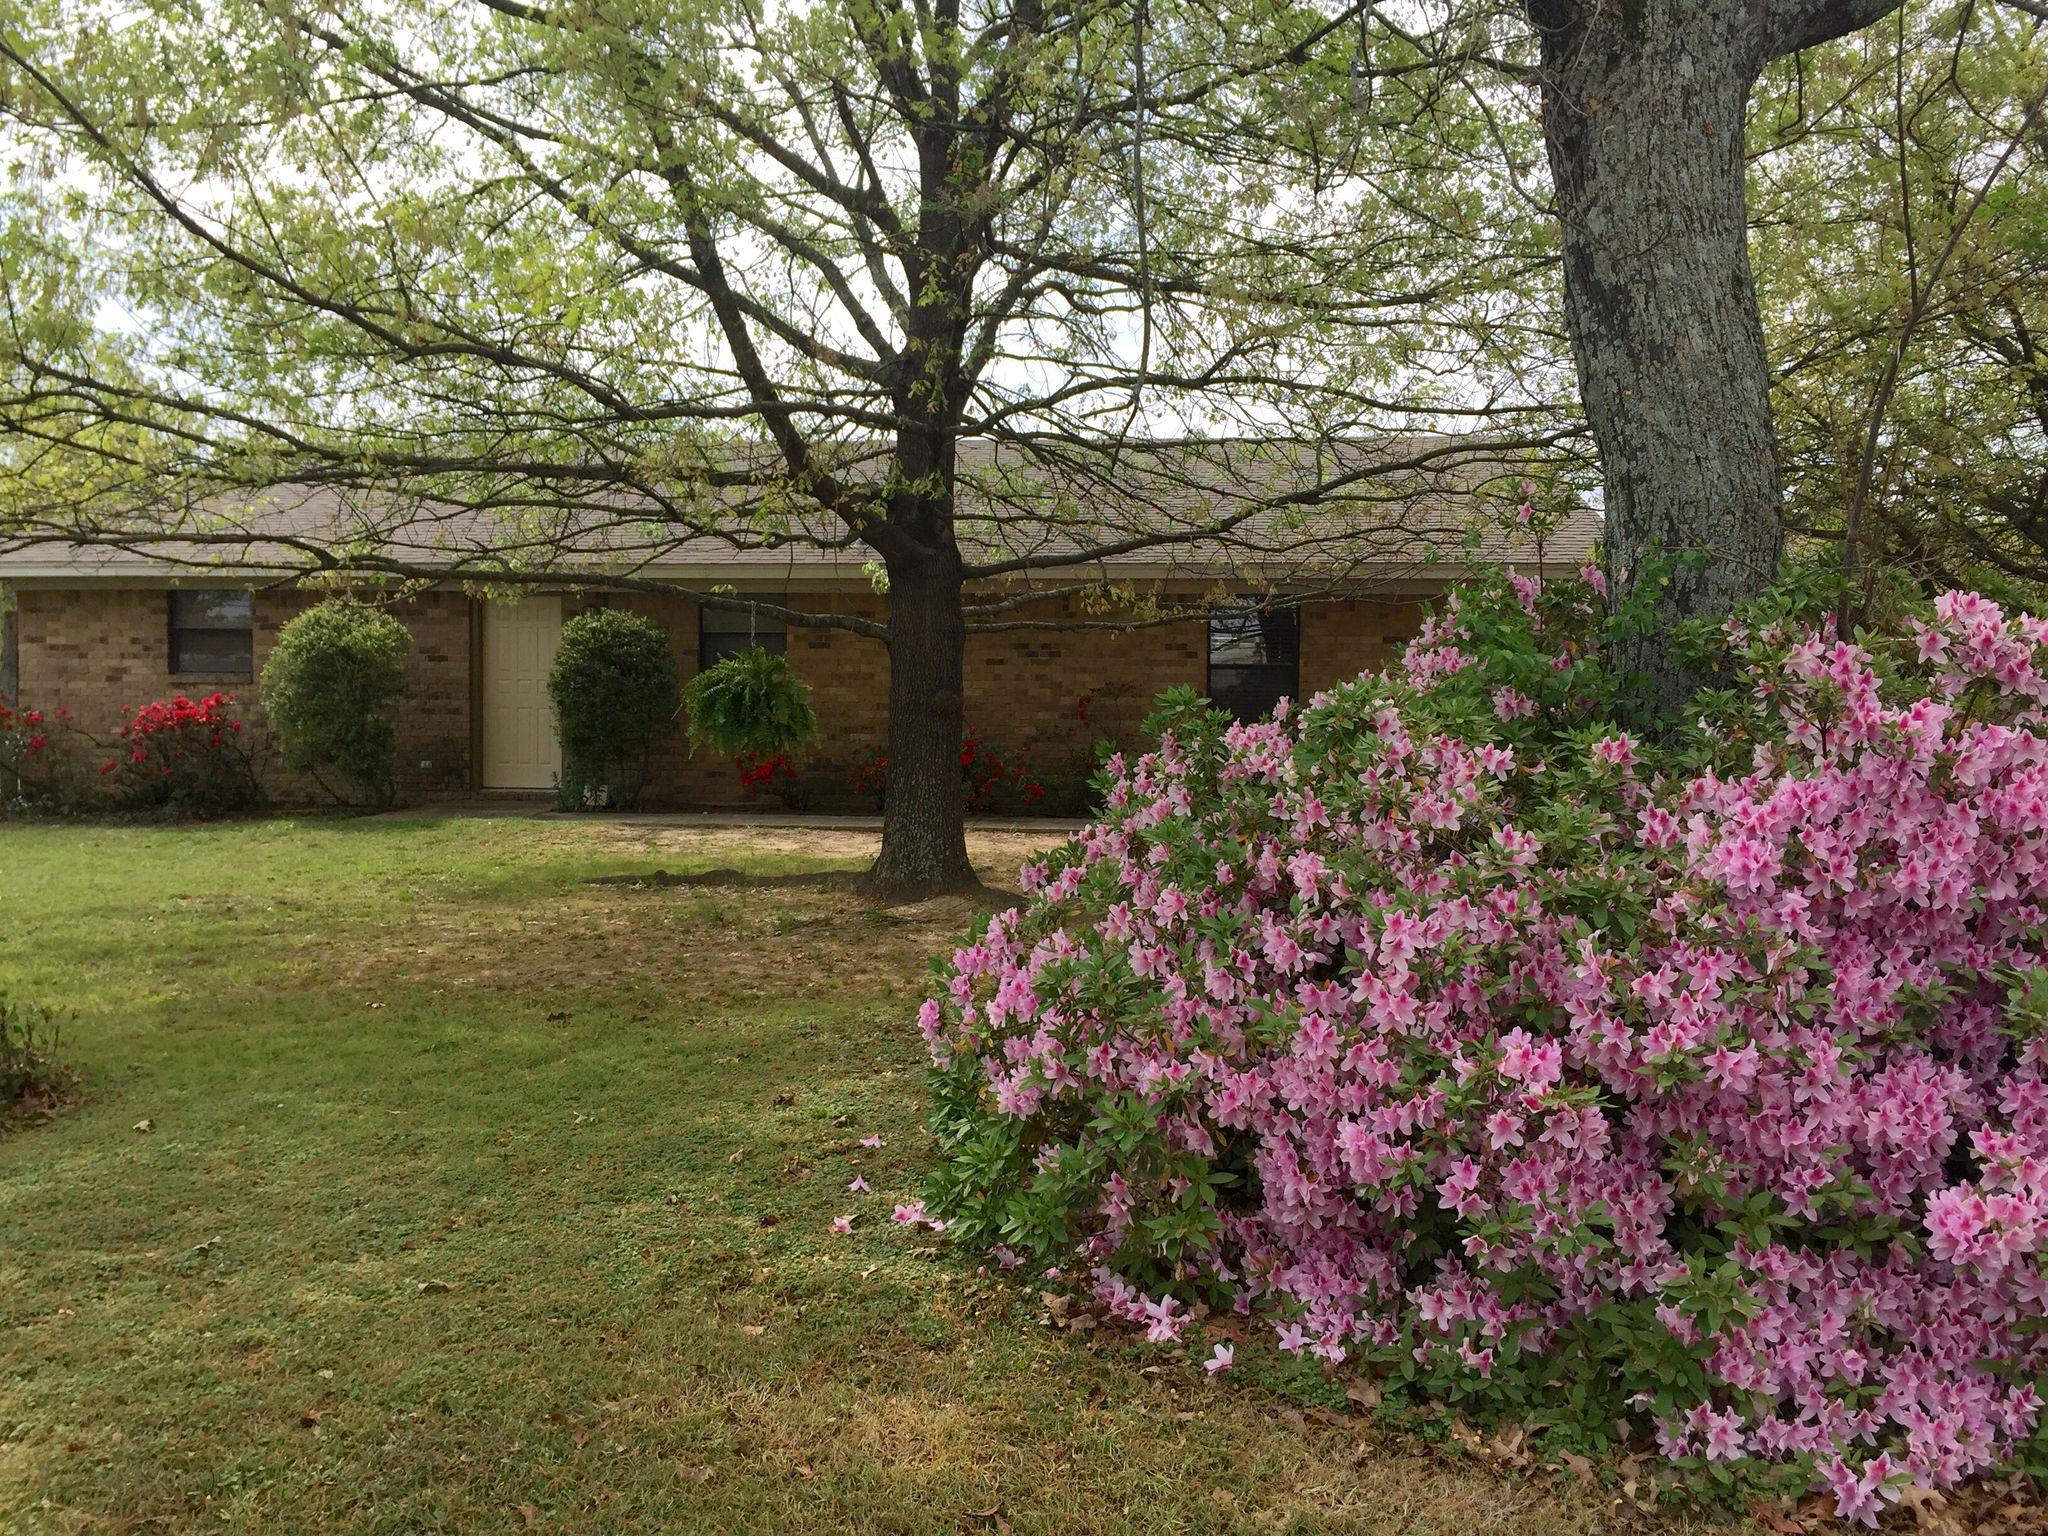 1015 Fair Oaks Dr, Texarkana, TX 75503 - Estimate and Home Details ...